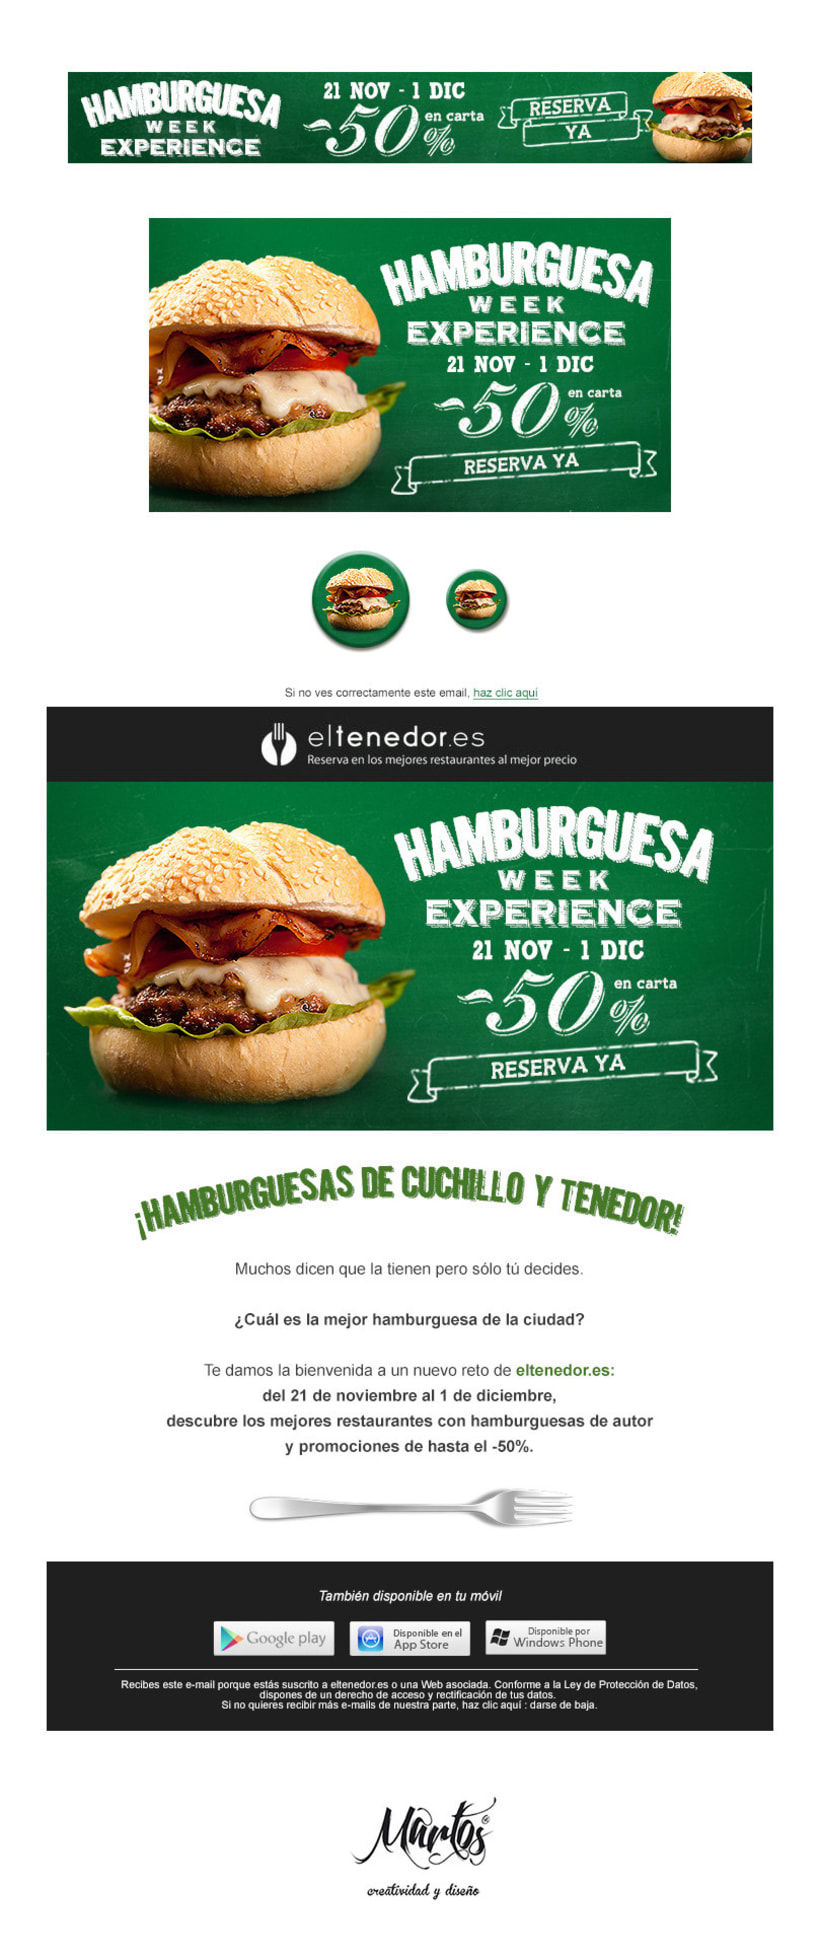 Hamburguesa Week Experience 1